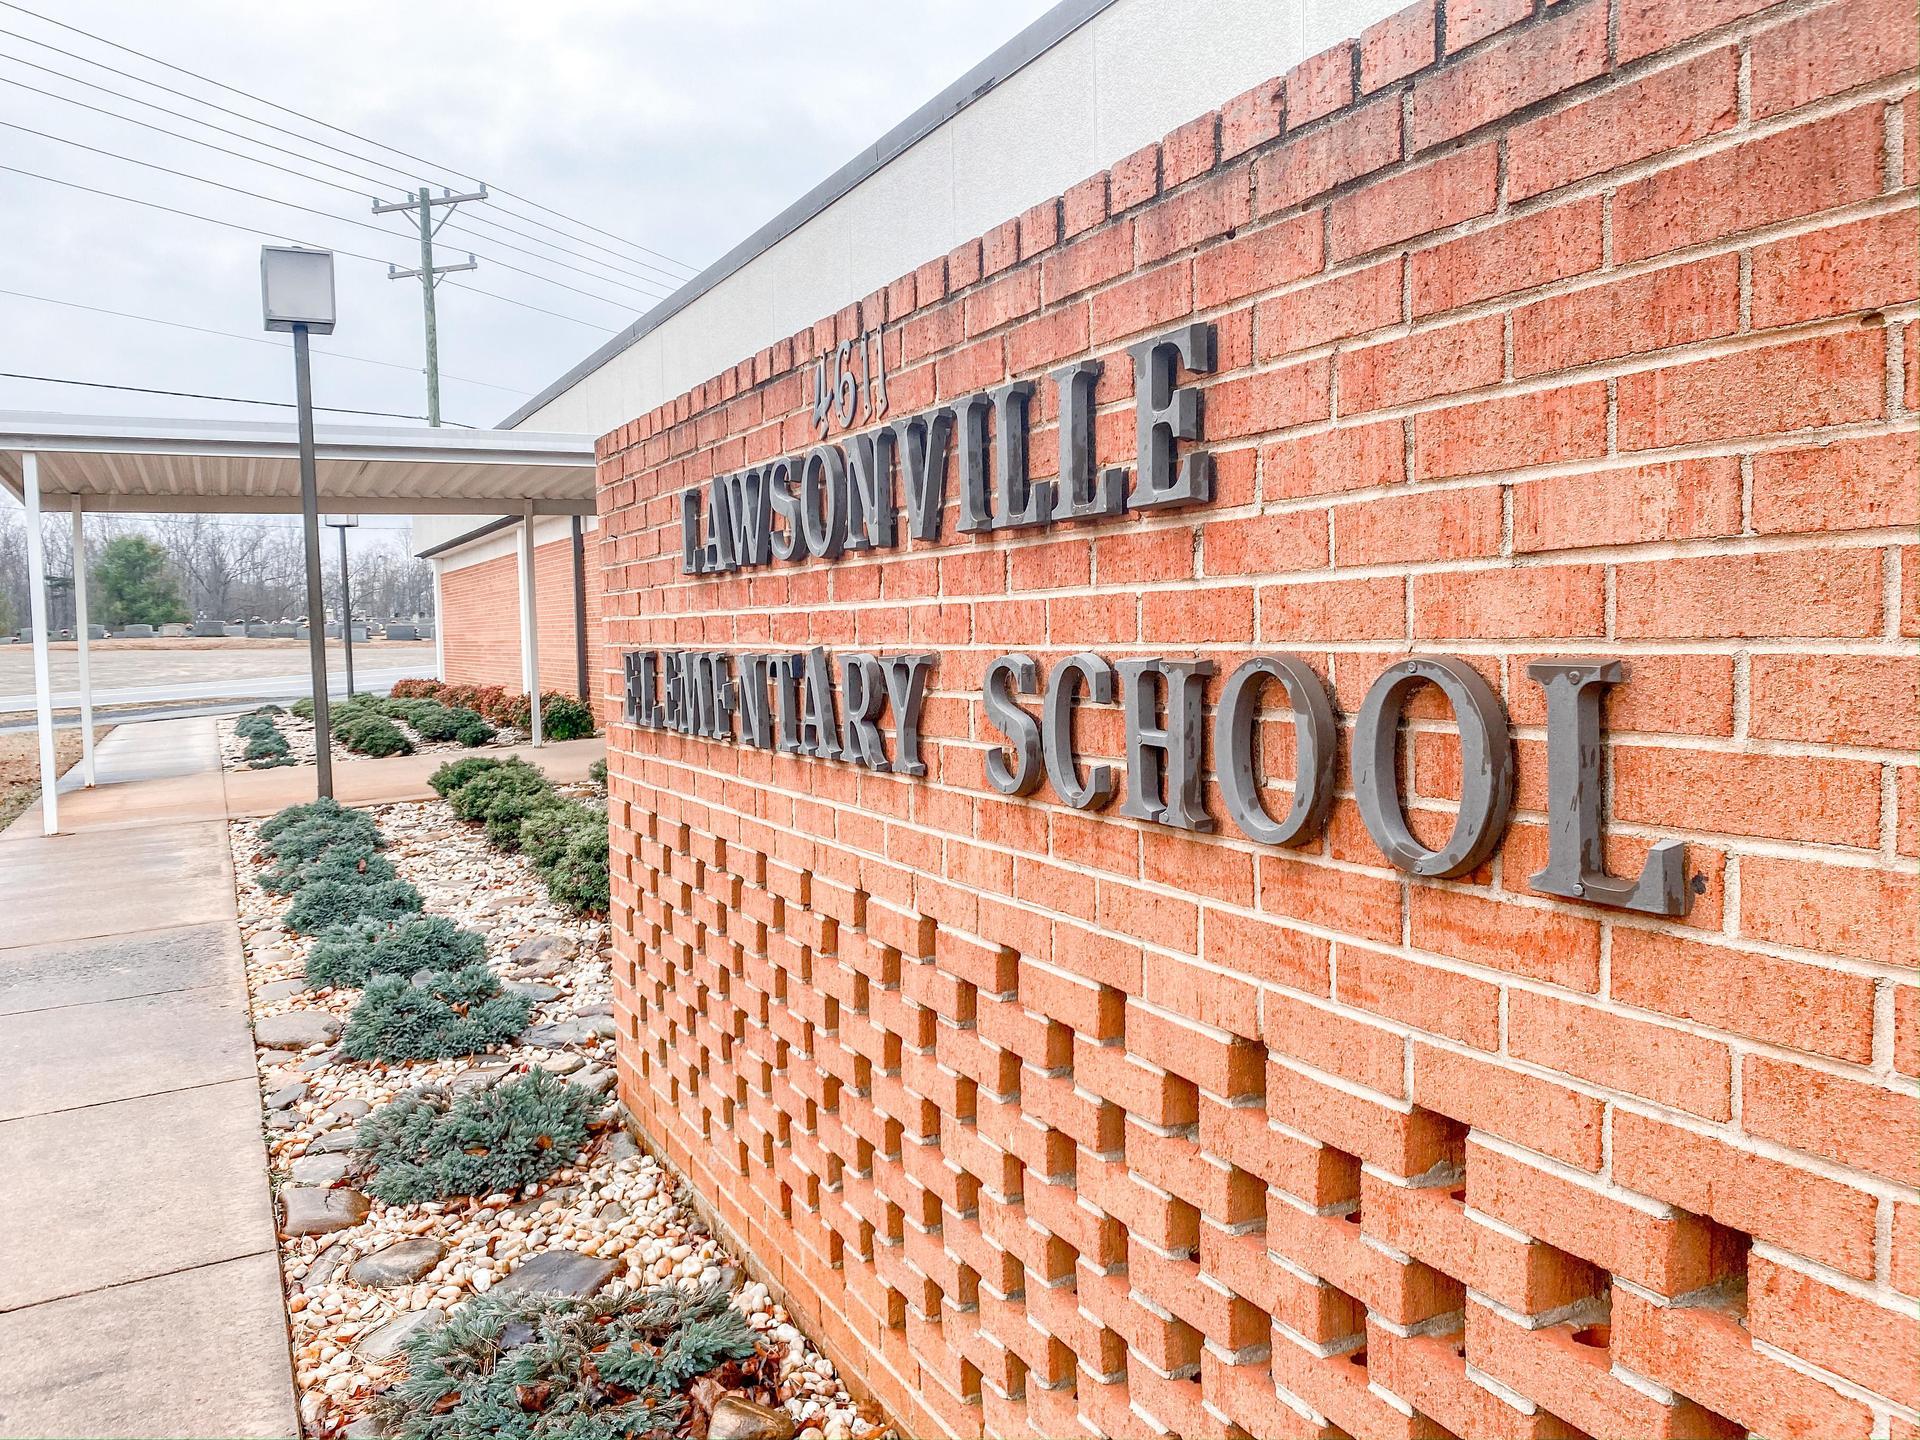 Lawsonville Elementary